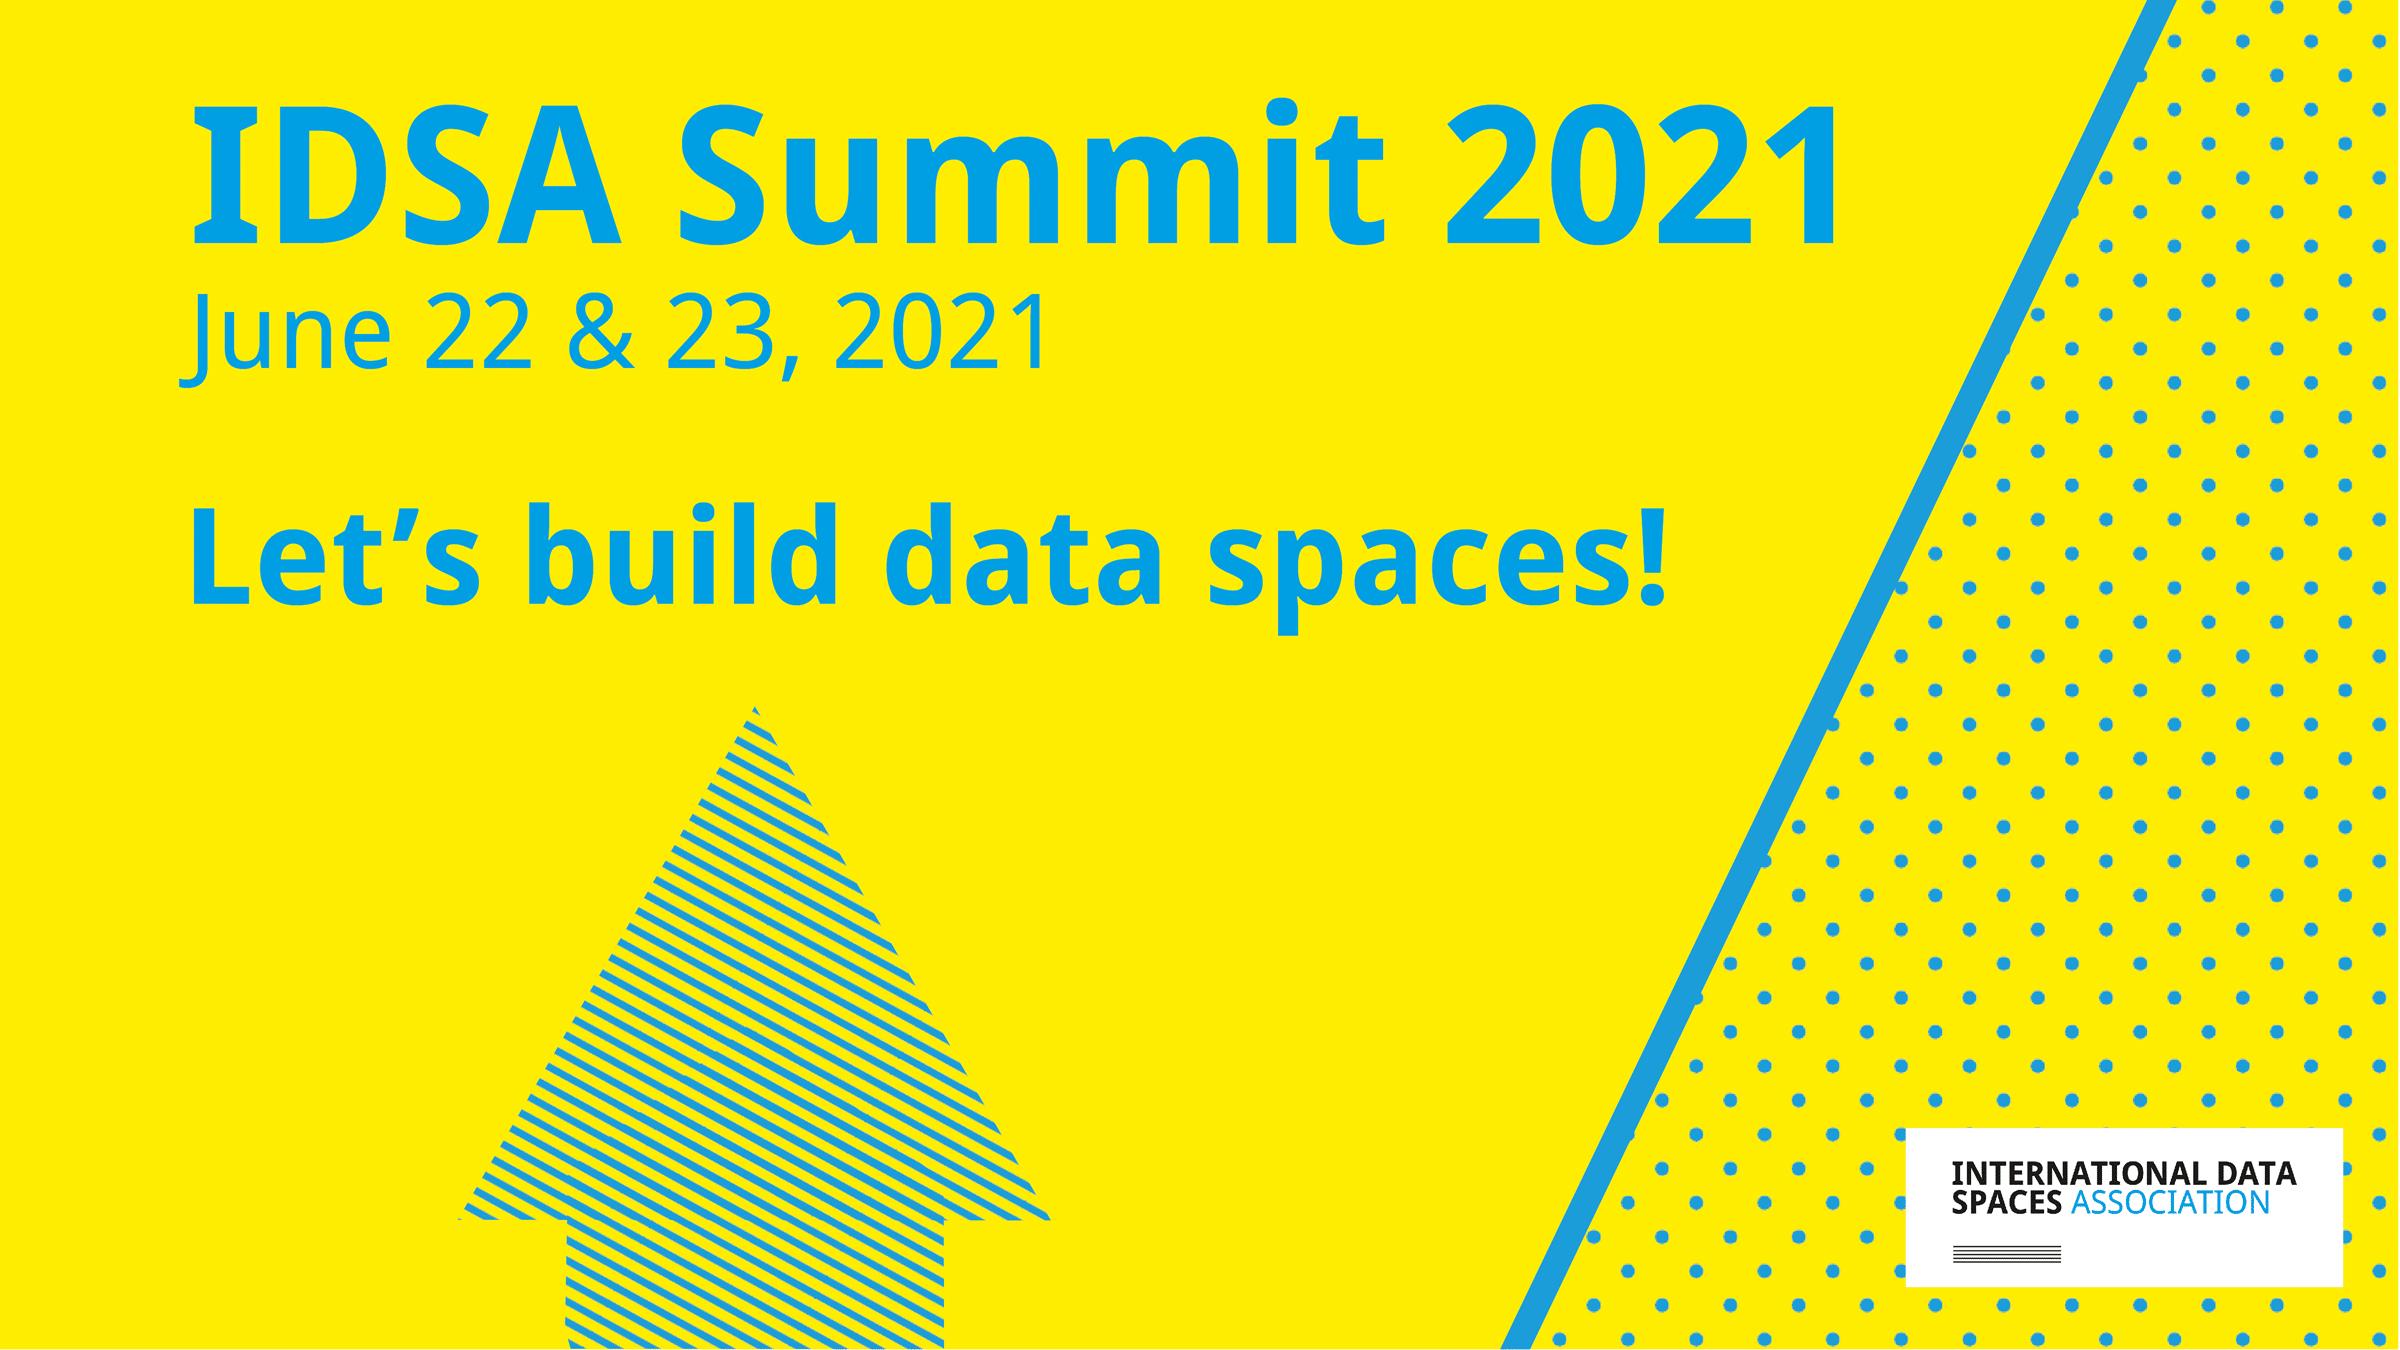 IDSA-Summit-2021-Key-Visual-yellow